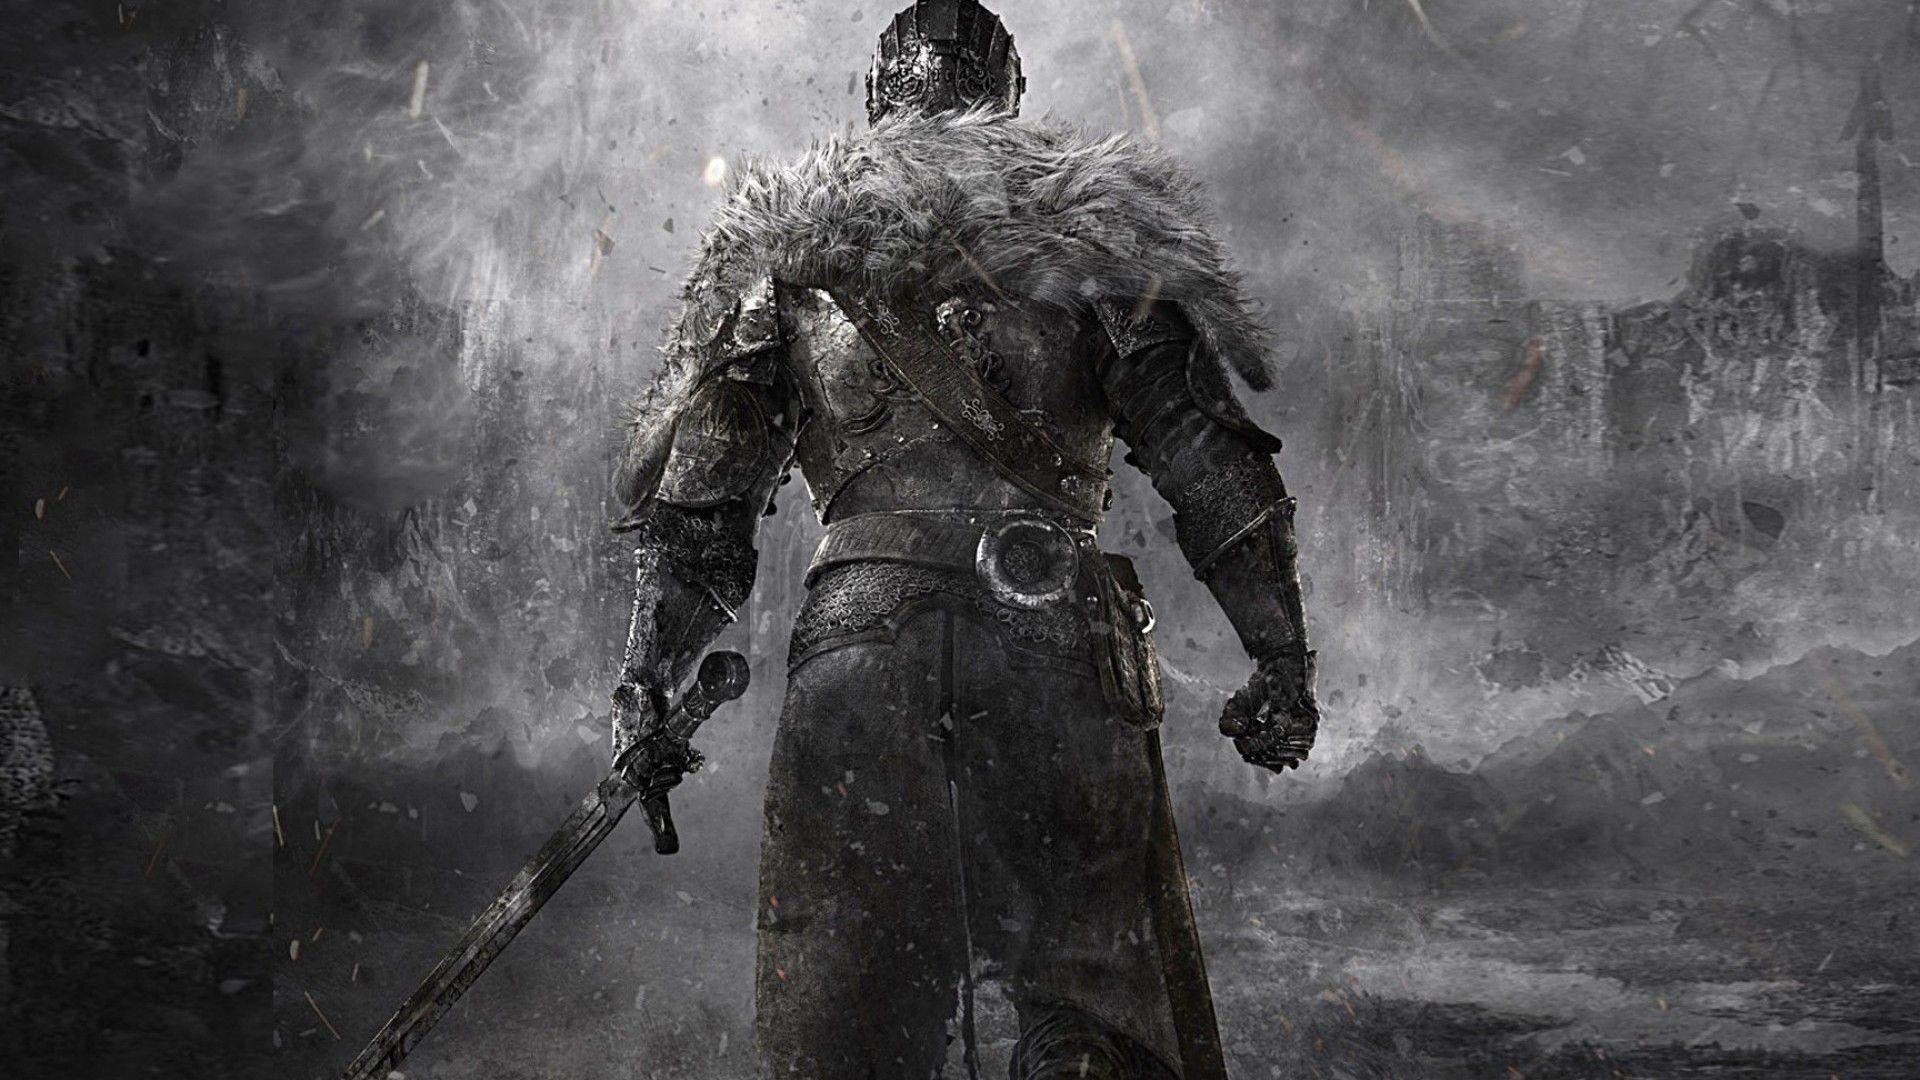 Best Dark Souls Ii Wallpaper 2021 Live Wallpaper Hd Dark Souls 2 Dark Souls Dark Souls 3